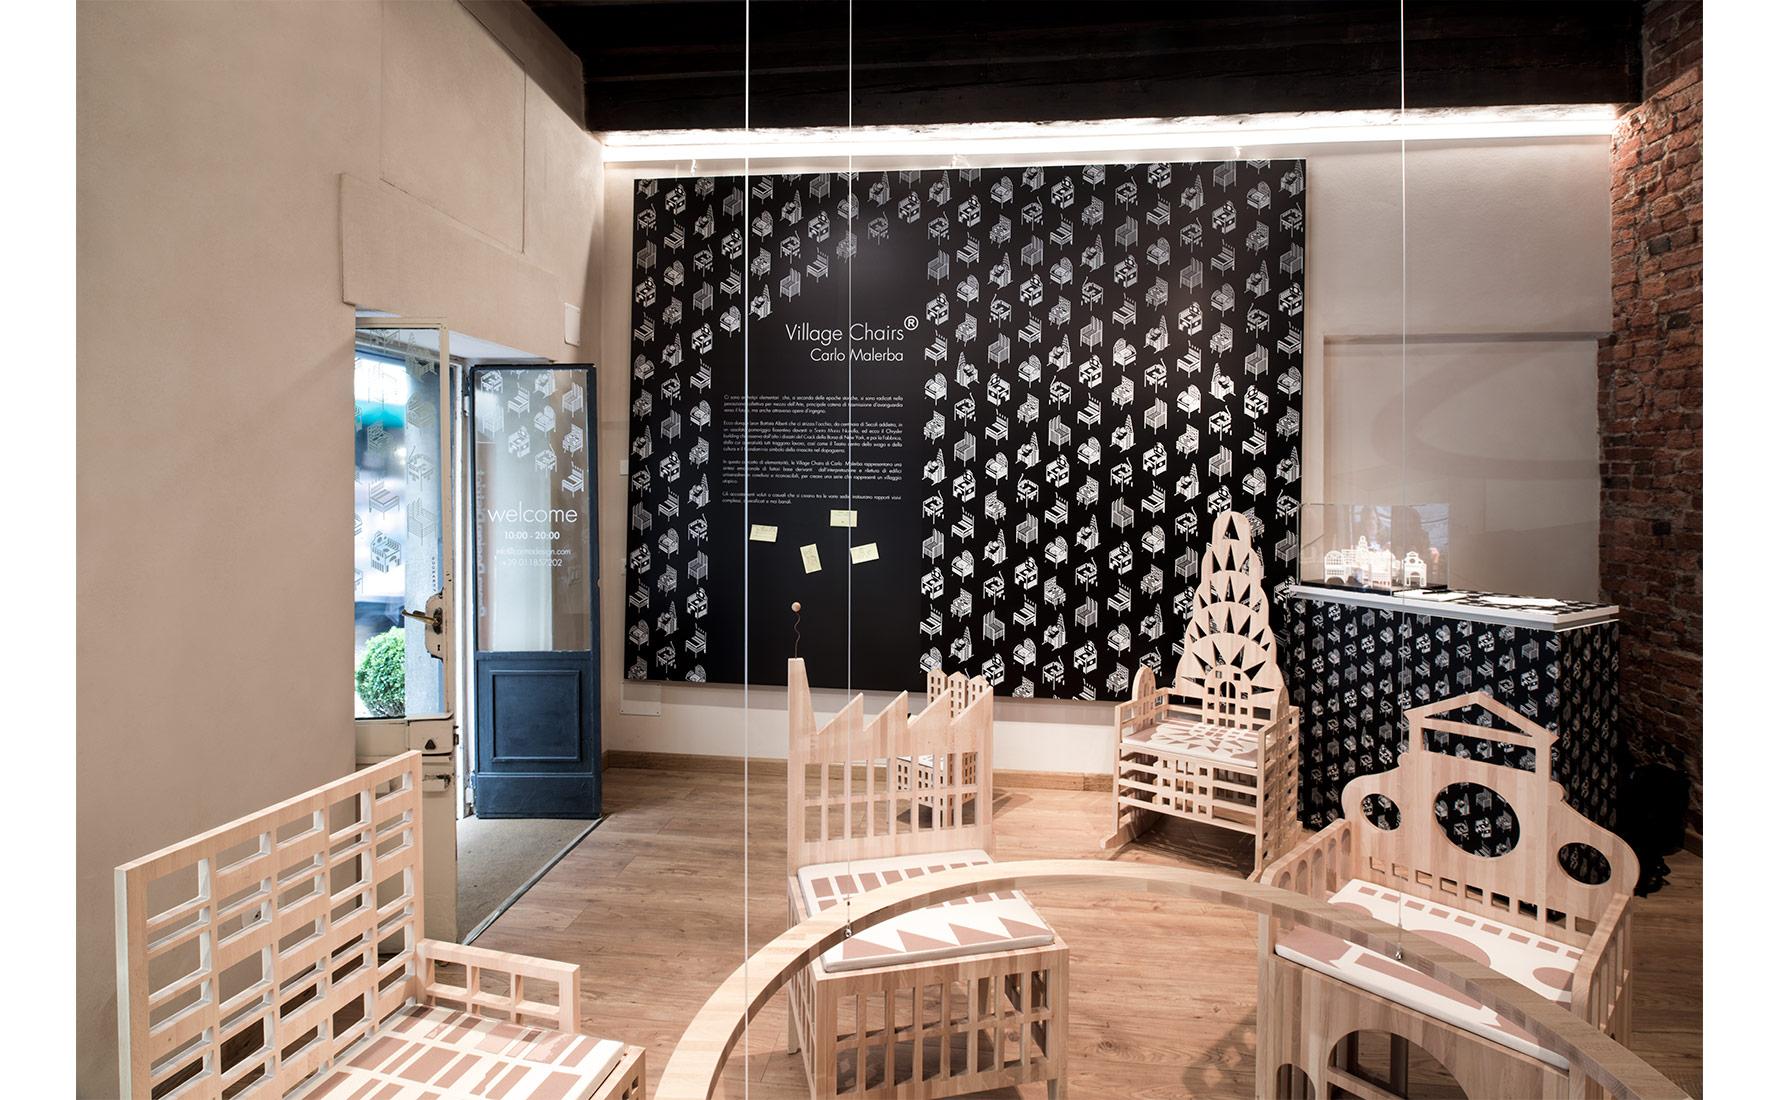 marco-tacchini-photographer-village-chairs-milano_07